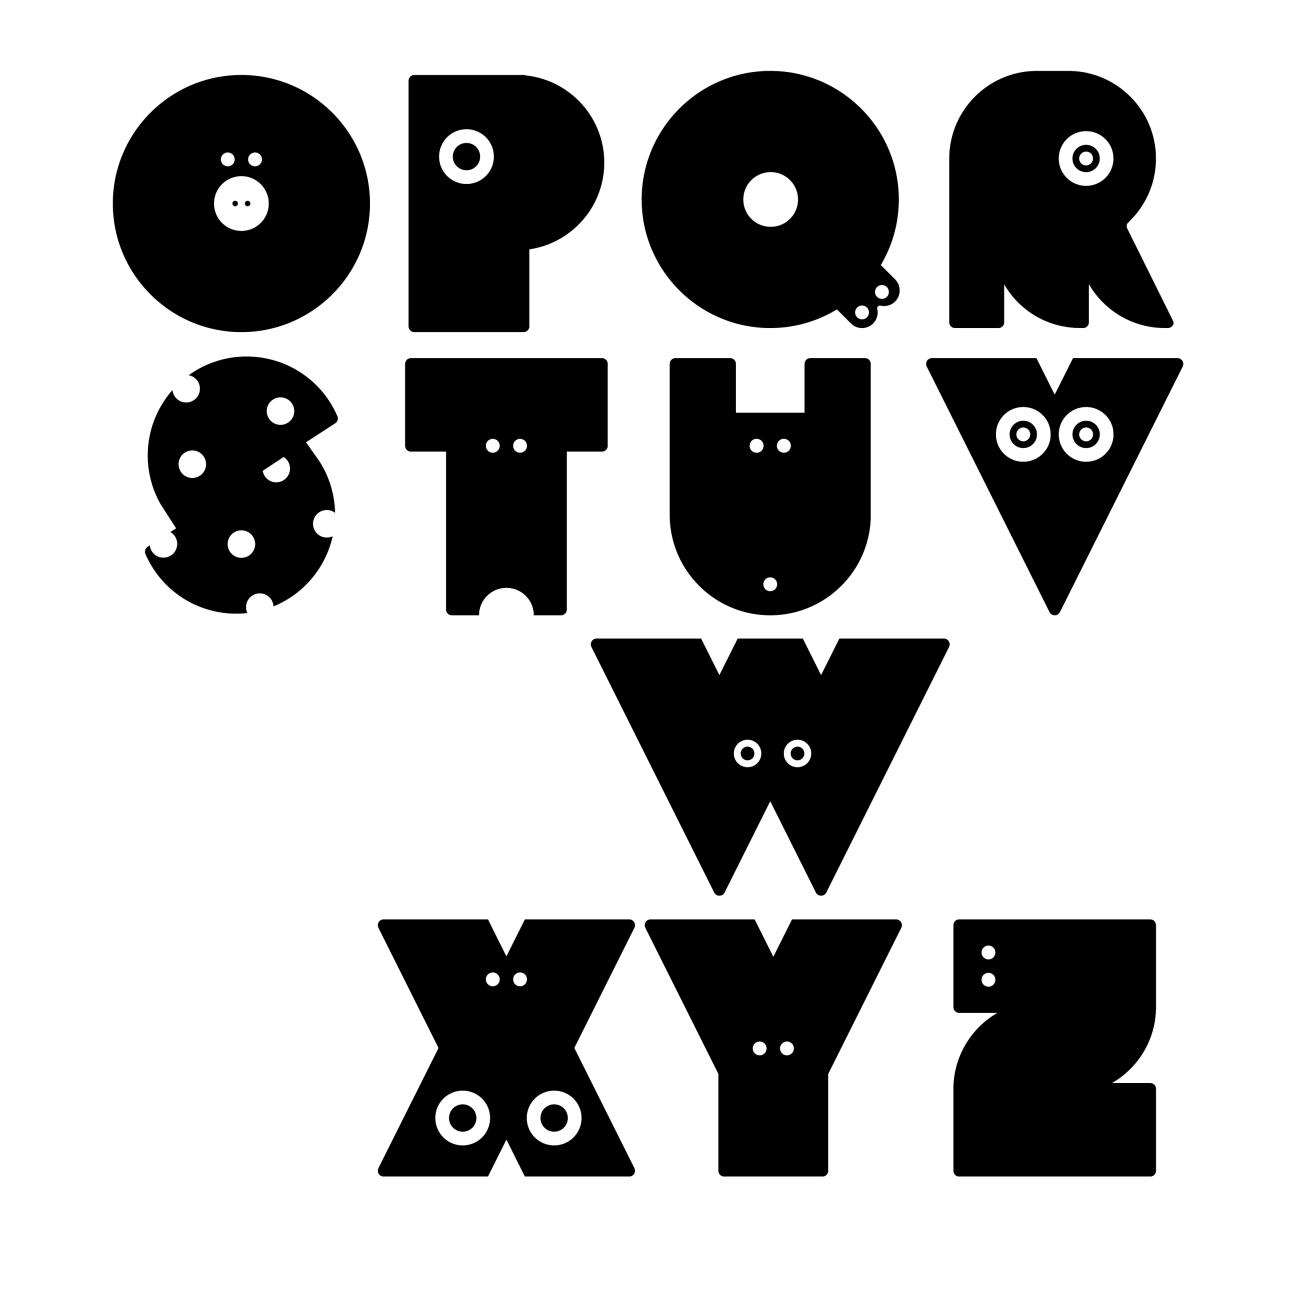 Djecà-Alphabet-Graphisme-LaurenceChene-2-01